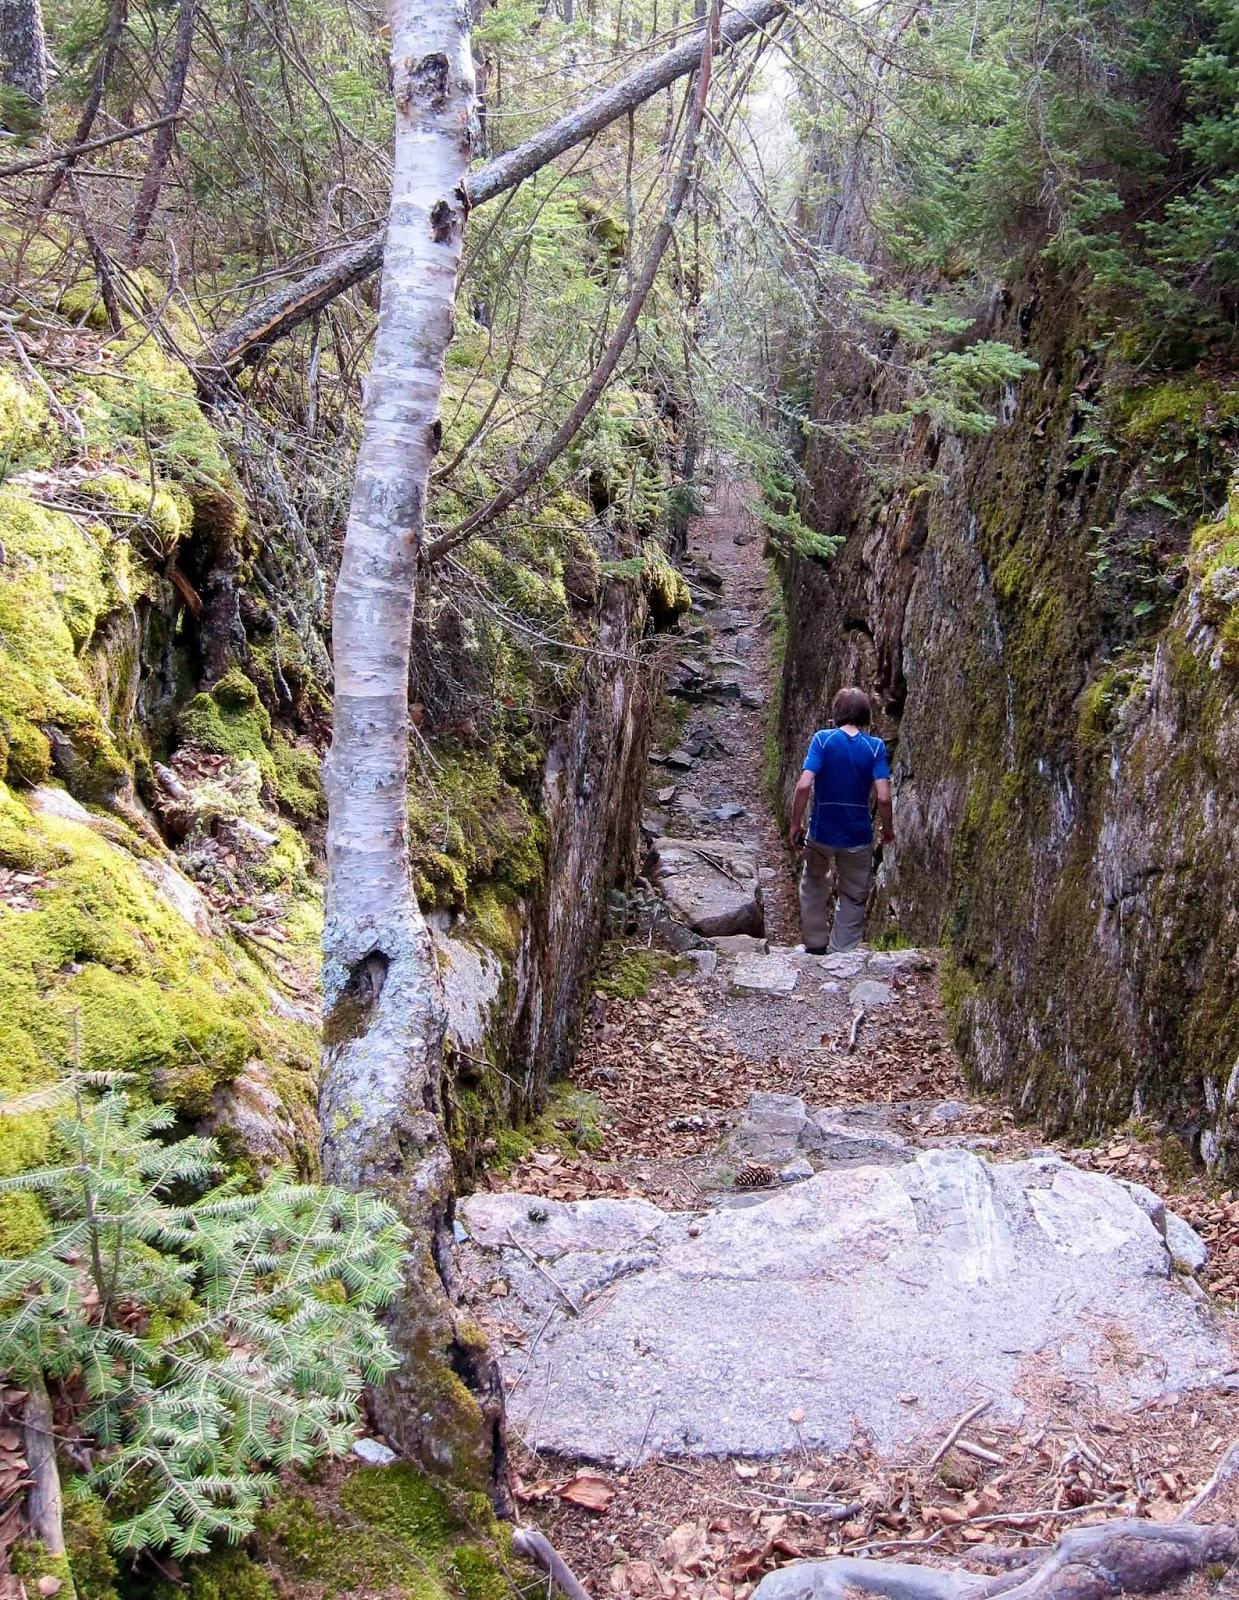 Eric s hikes lake superior provincial park coastal trail may 8 11 2012